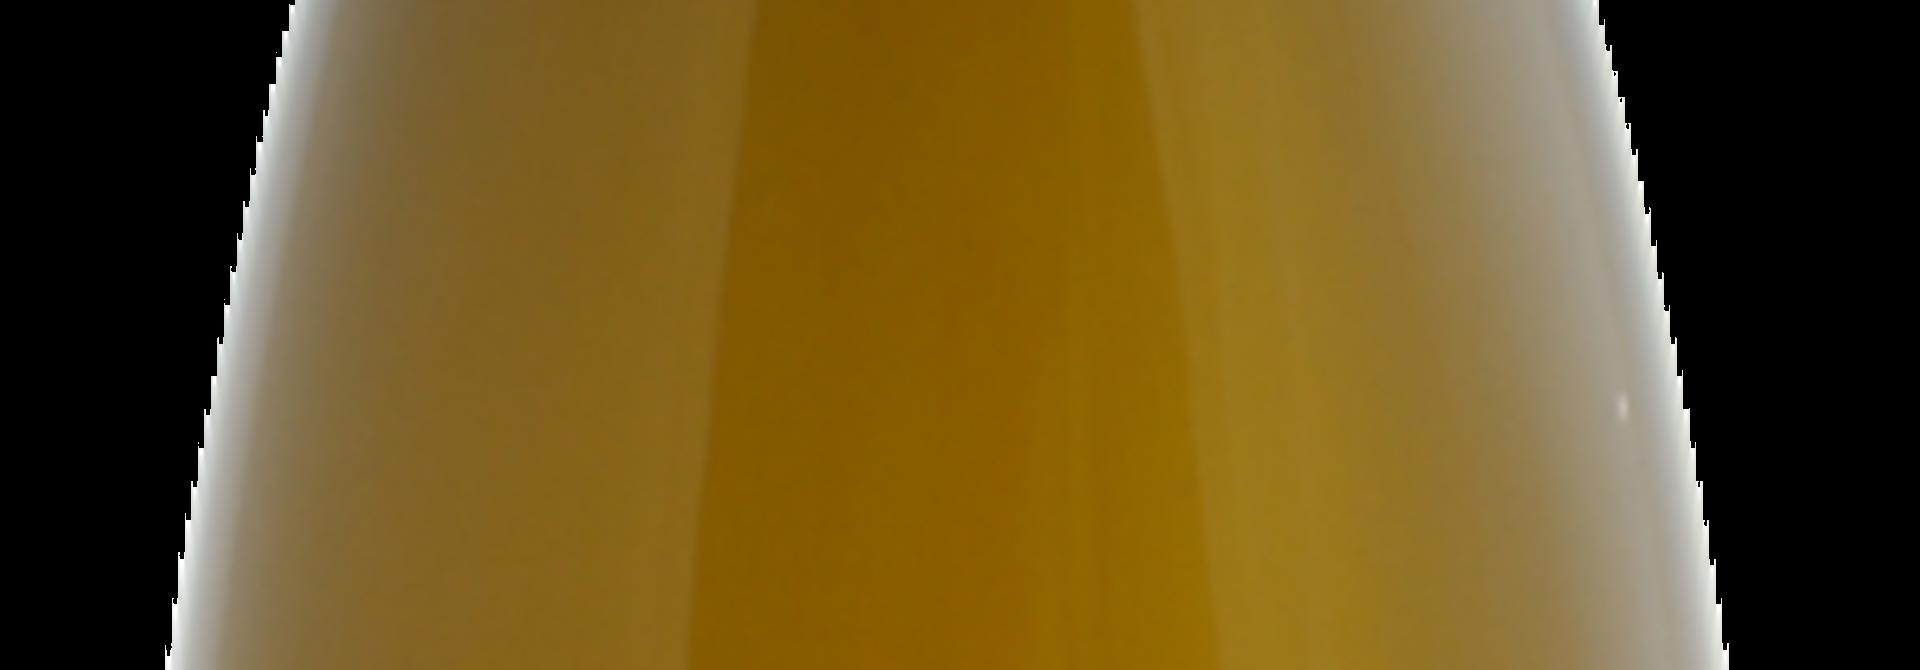 Domaine Marcel Deiss Pinot Gris 2016